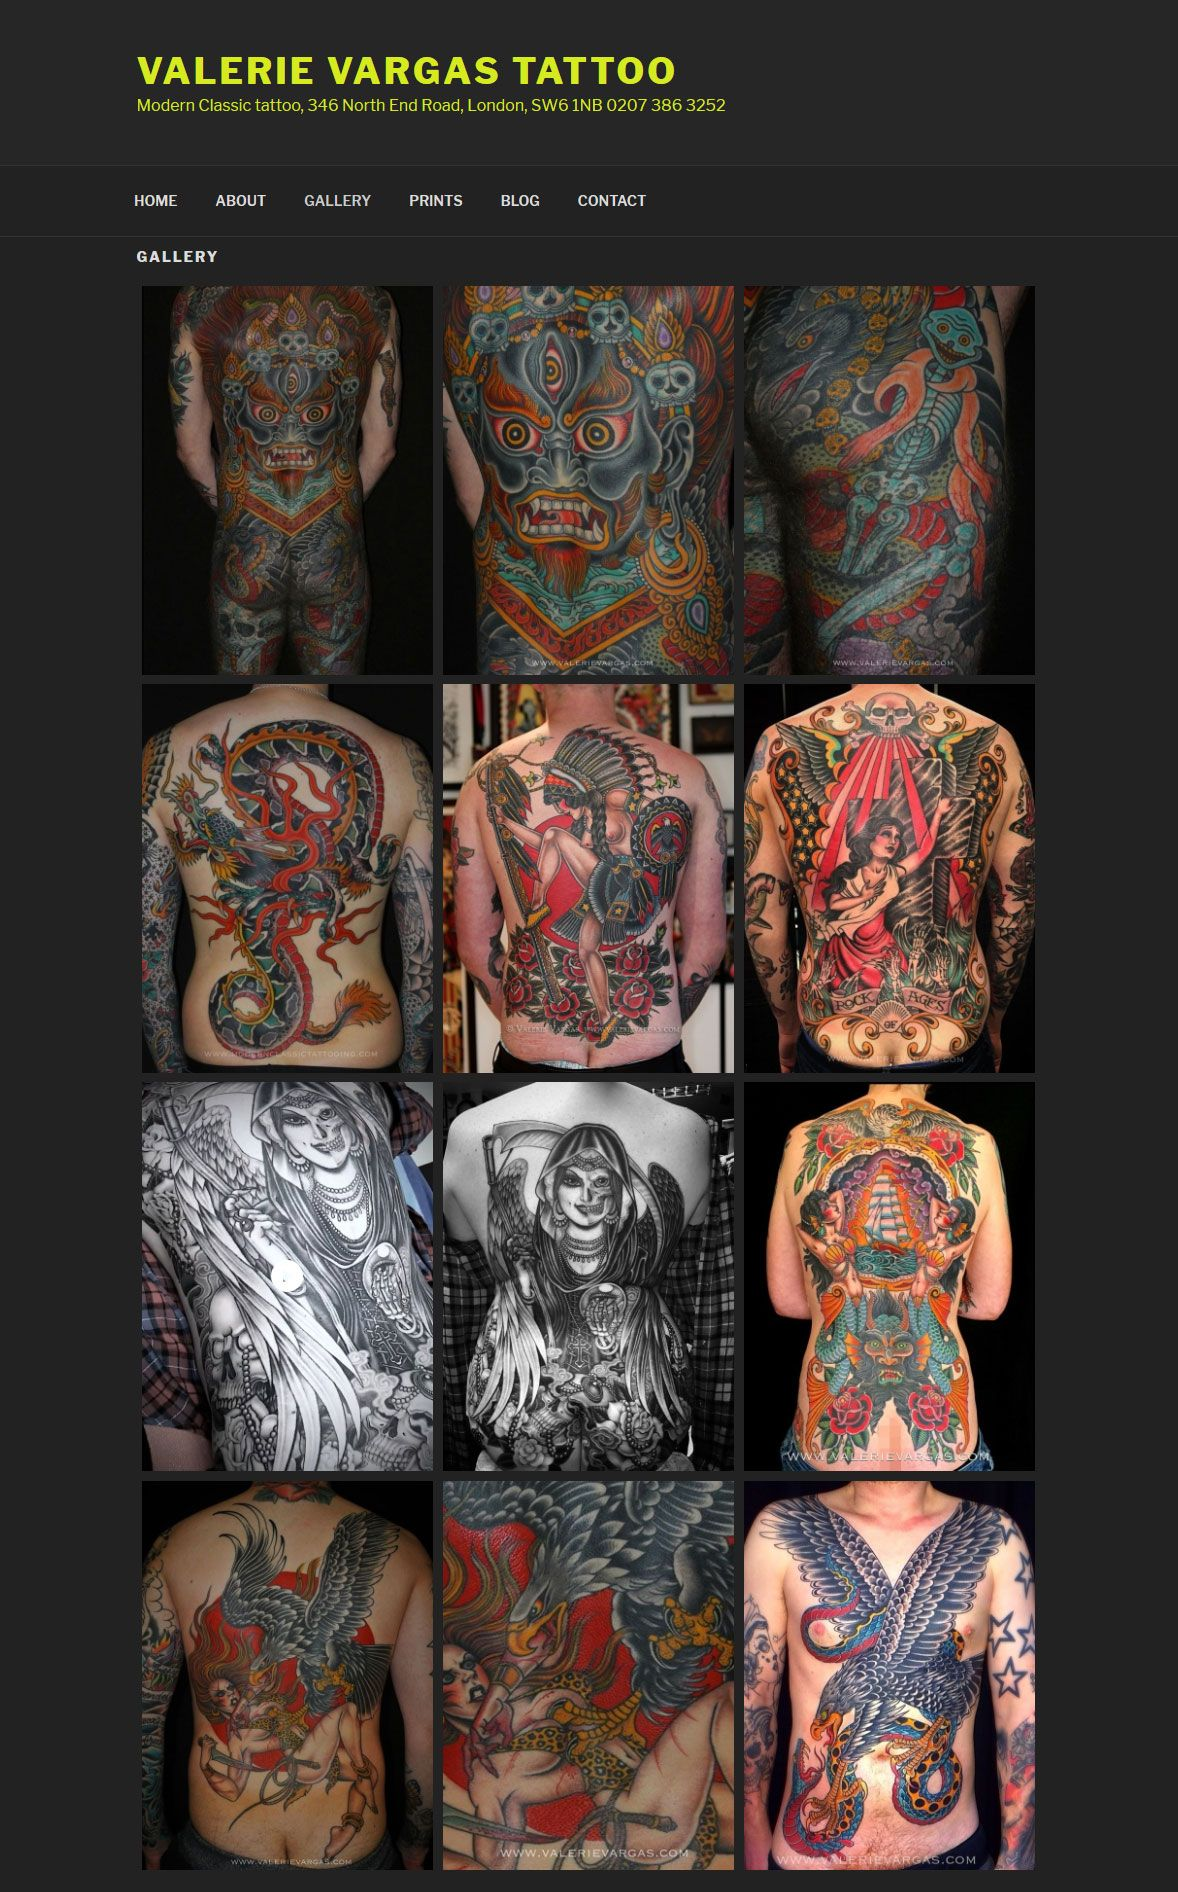 ValerieVargas.com Full Width Gallery Page